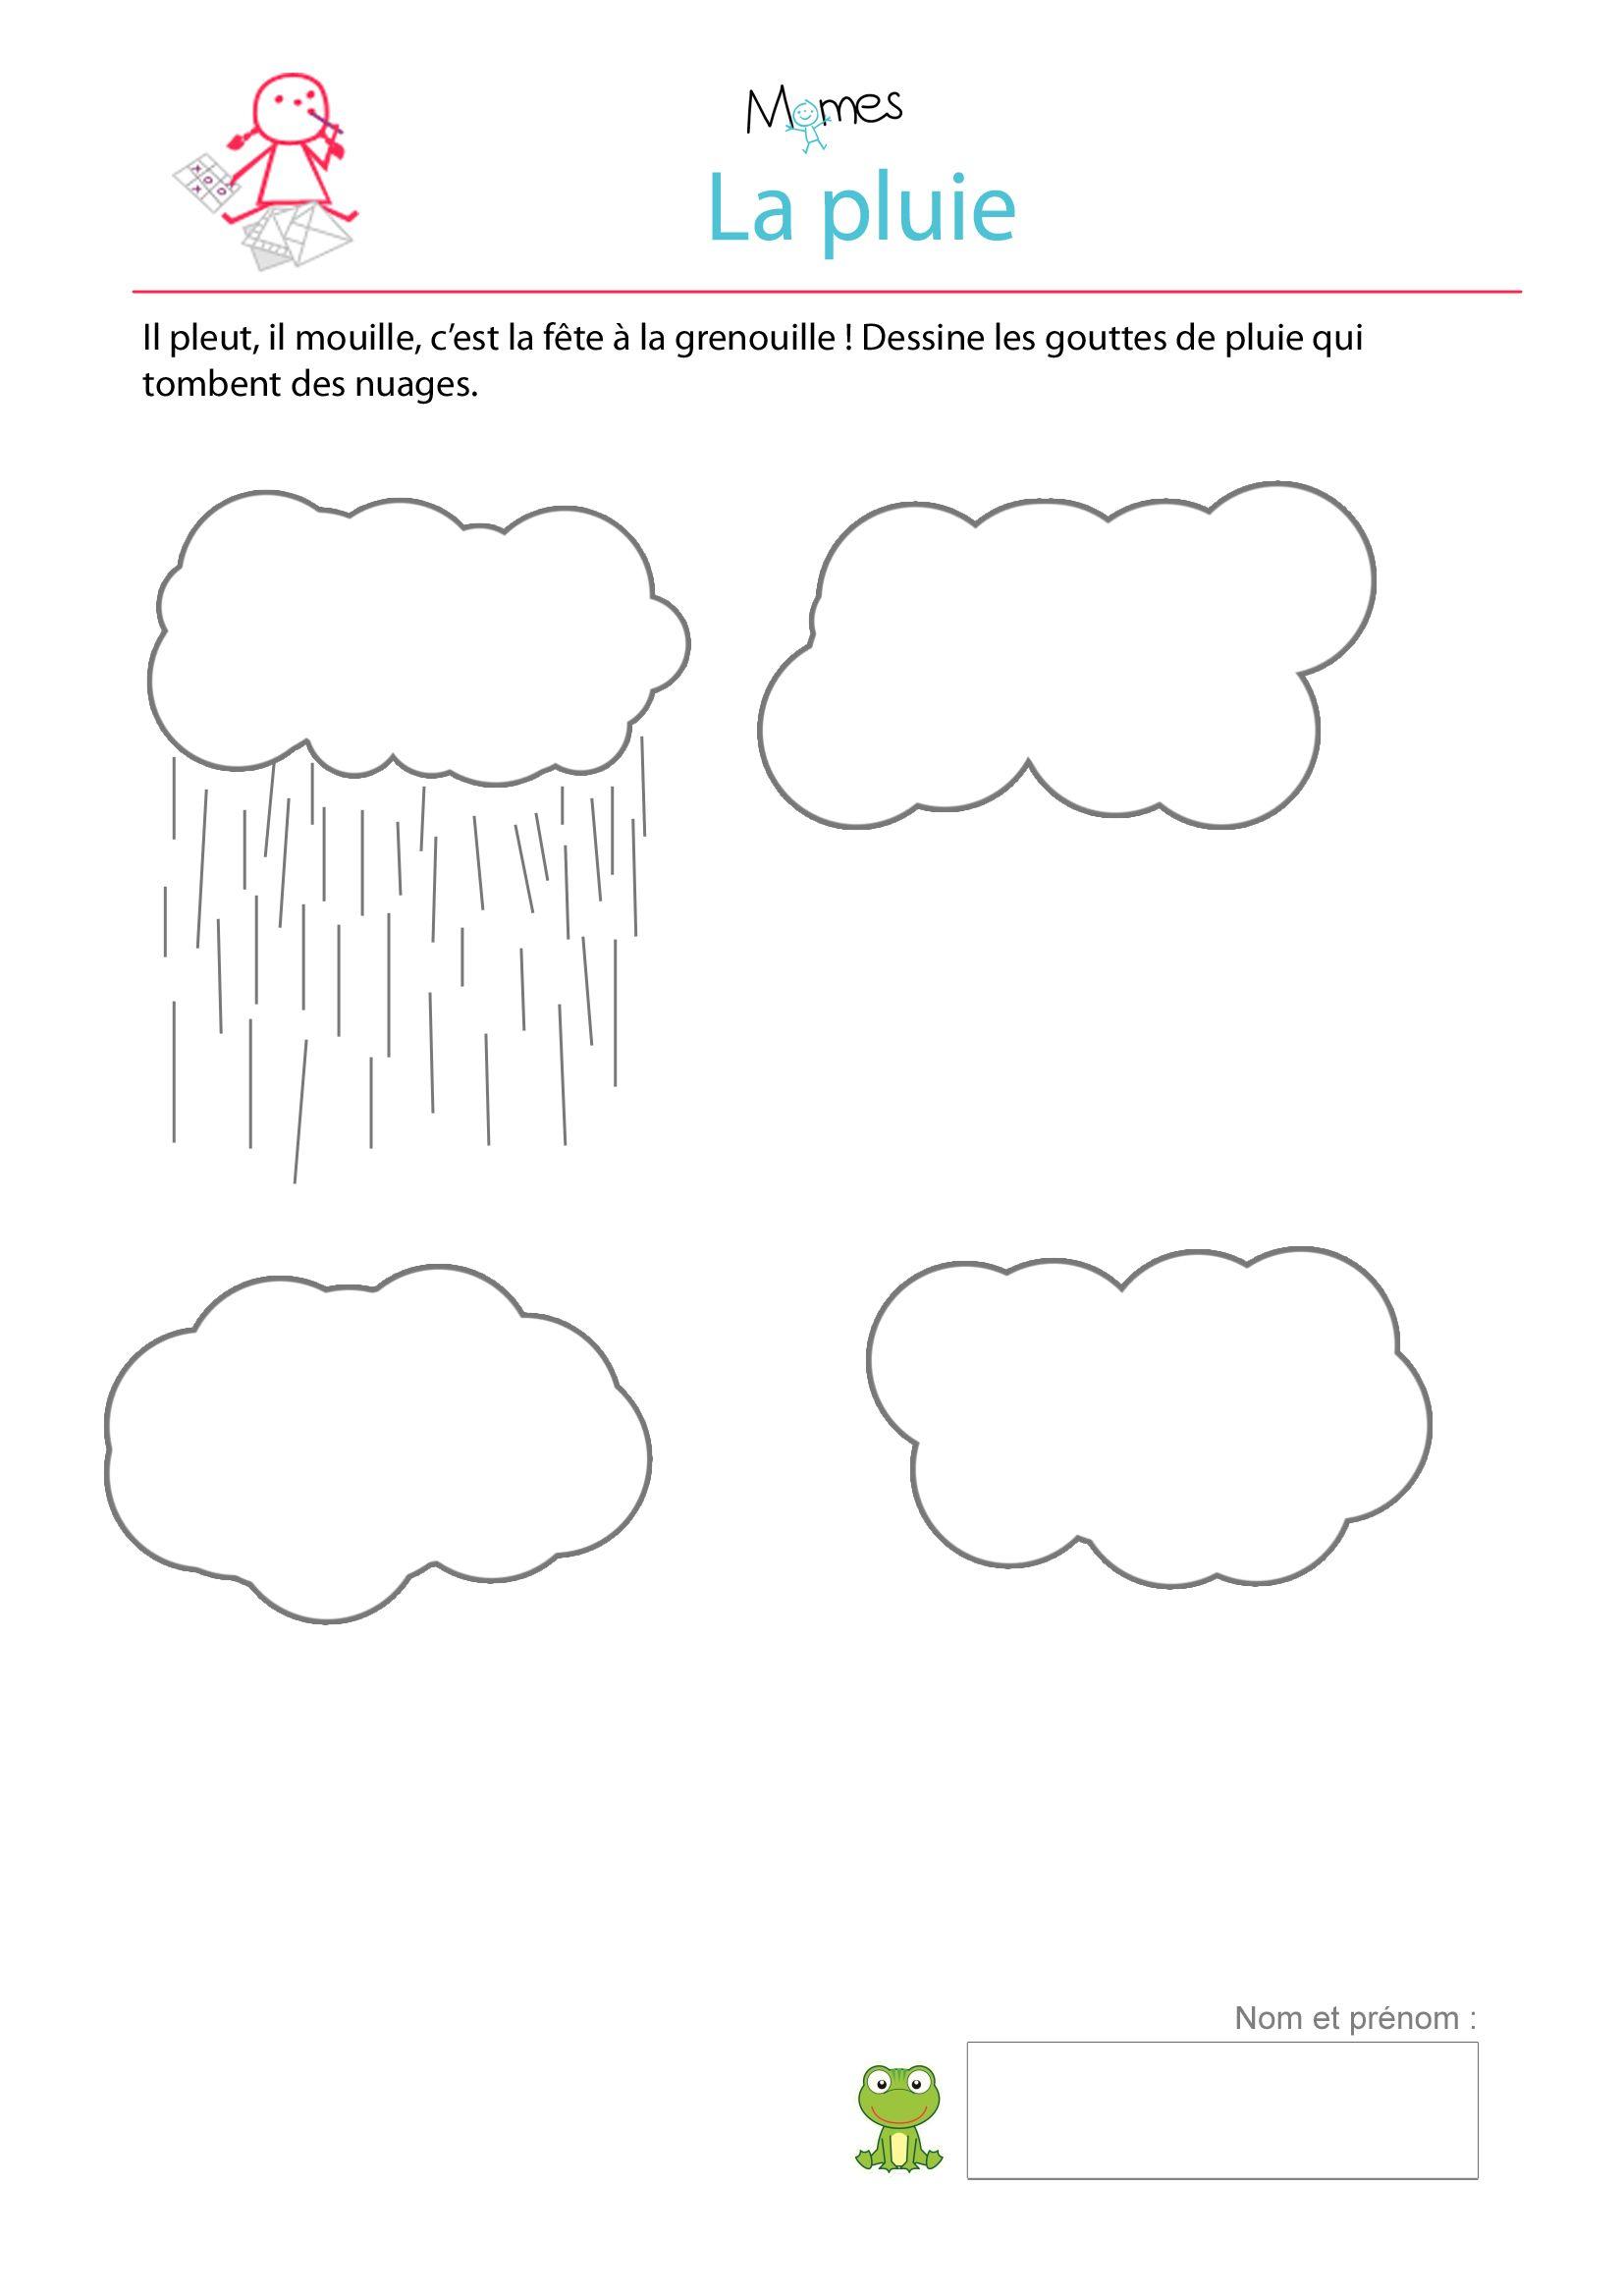 Dessine la pluie - exercice à imprimer | Exercice petite ...